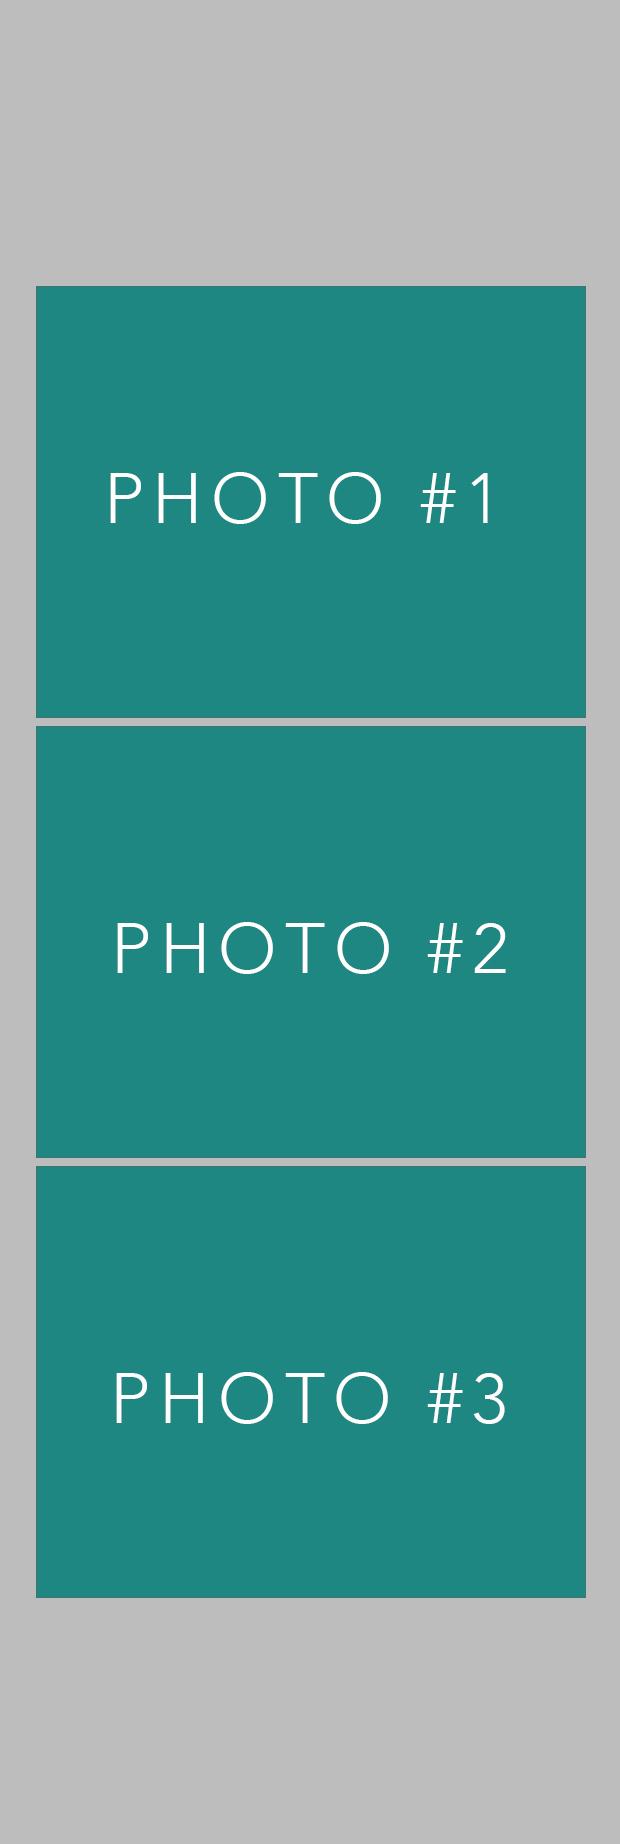 PHOTOSTRIP 3